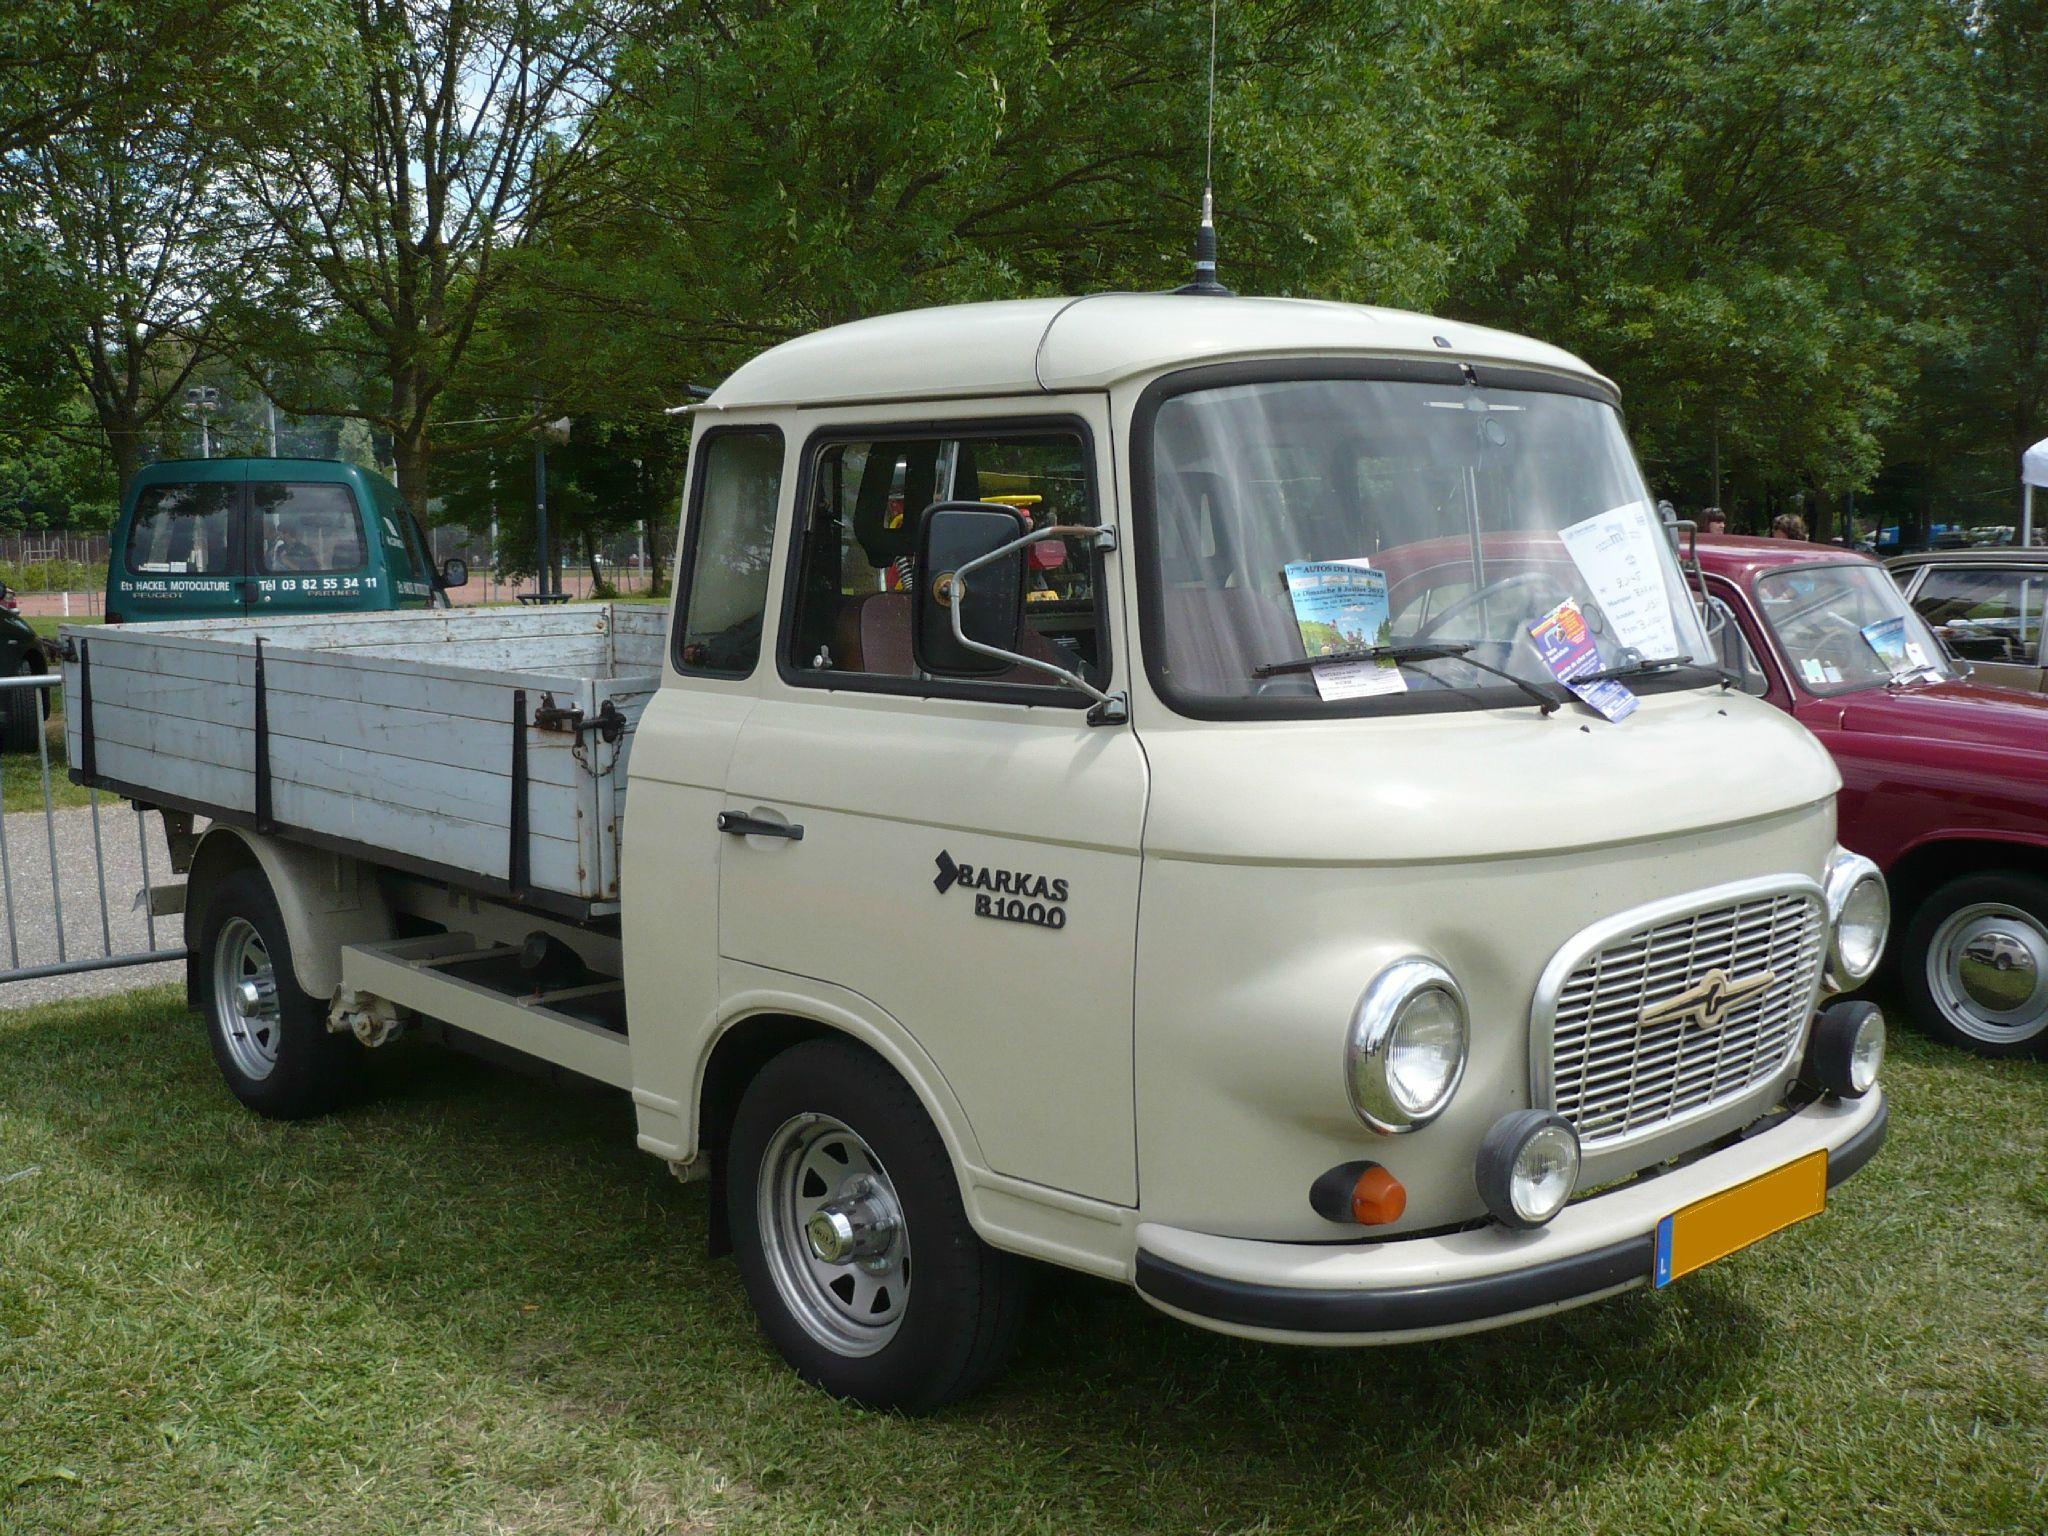 BARKAS B1000 pick-up Madine (1)